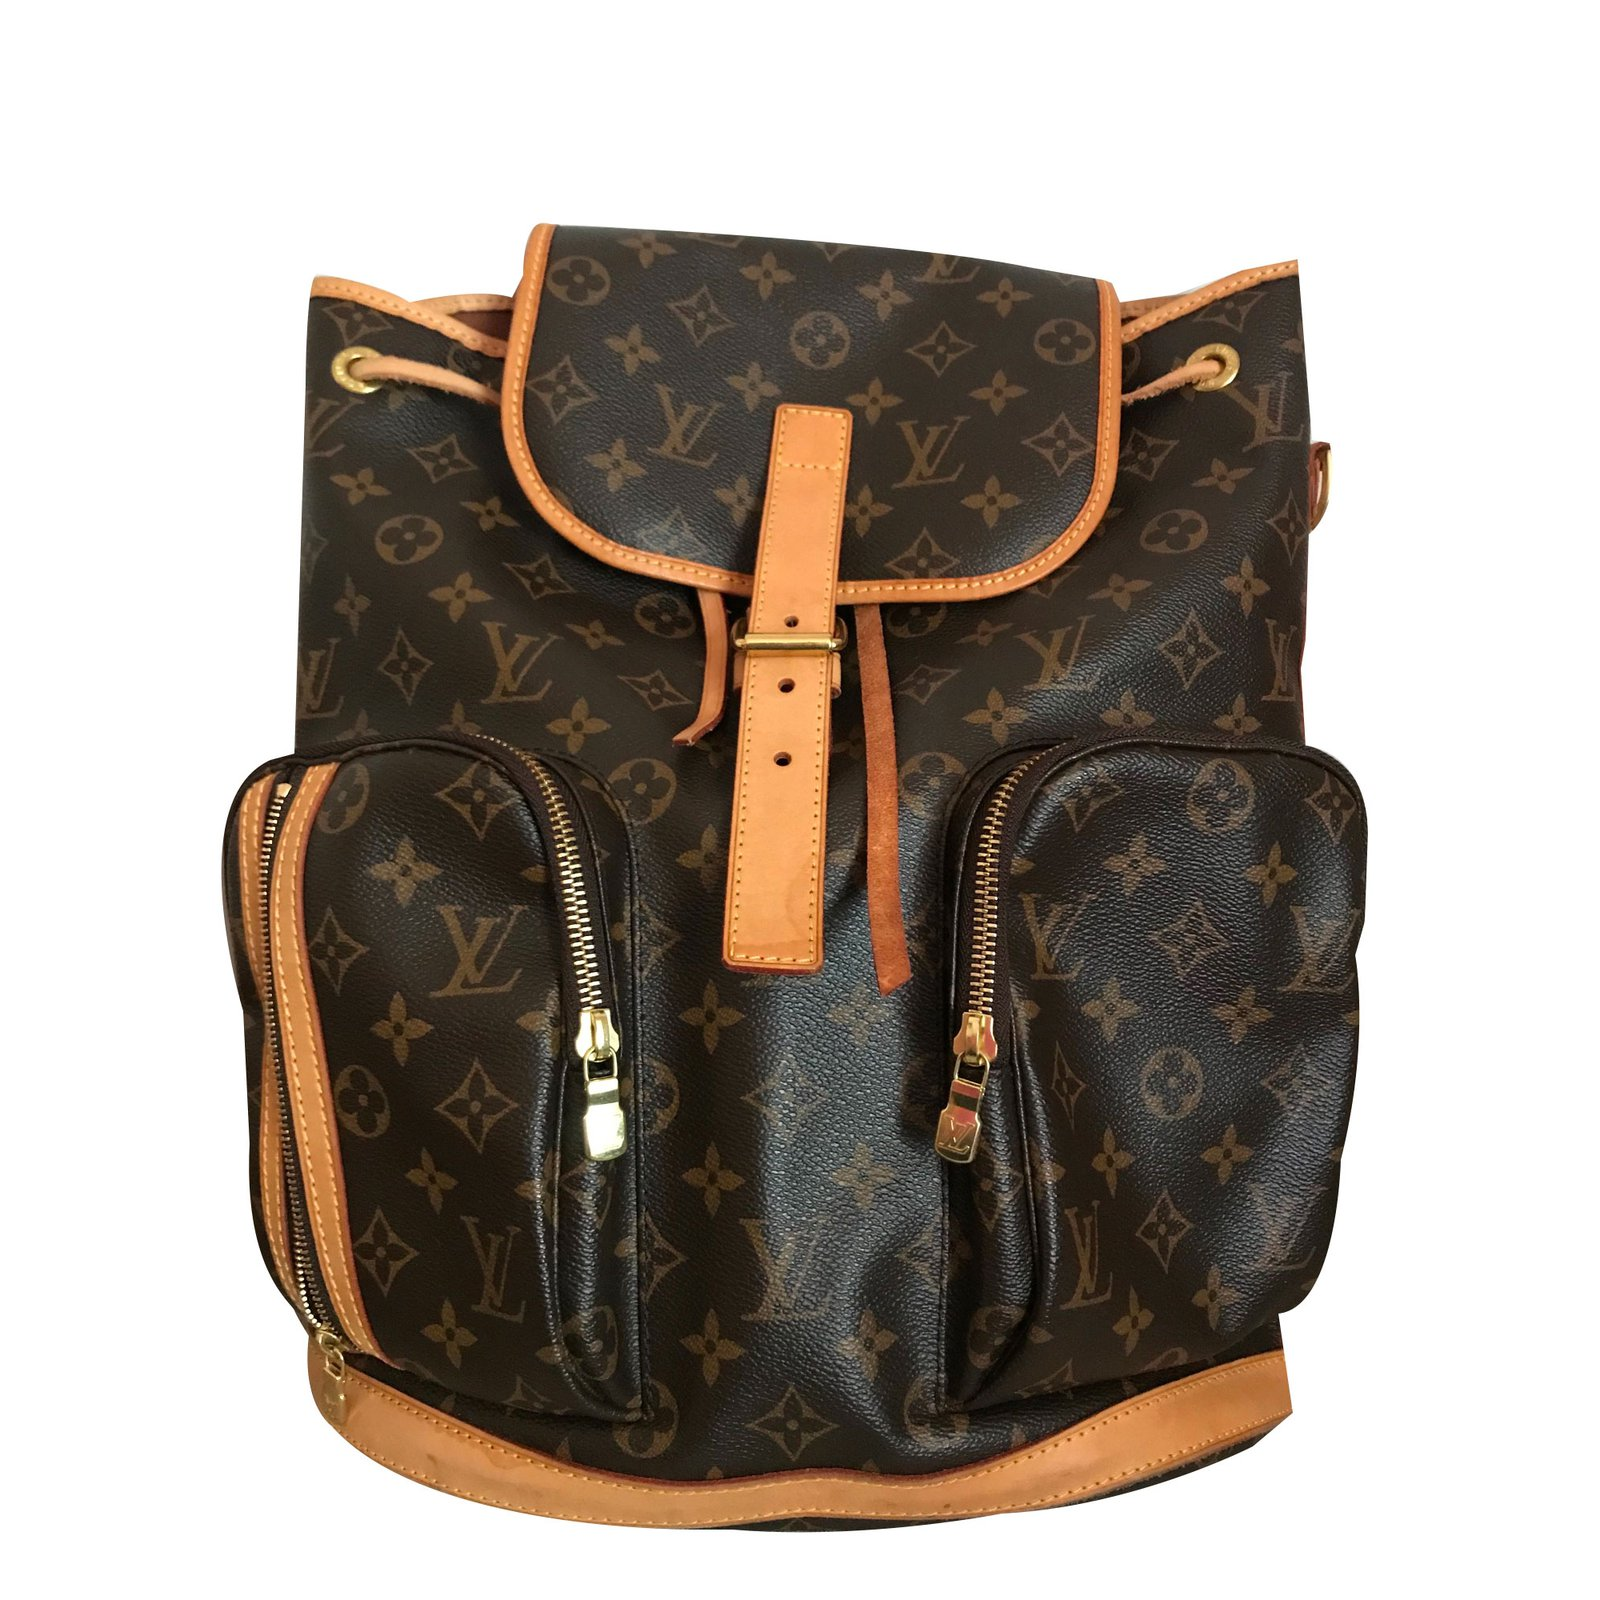 b18fb7a8bd70 Louis Vuitton Bosphore monogram Backpack Backpacks Leather